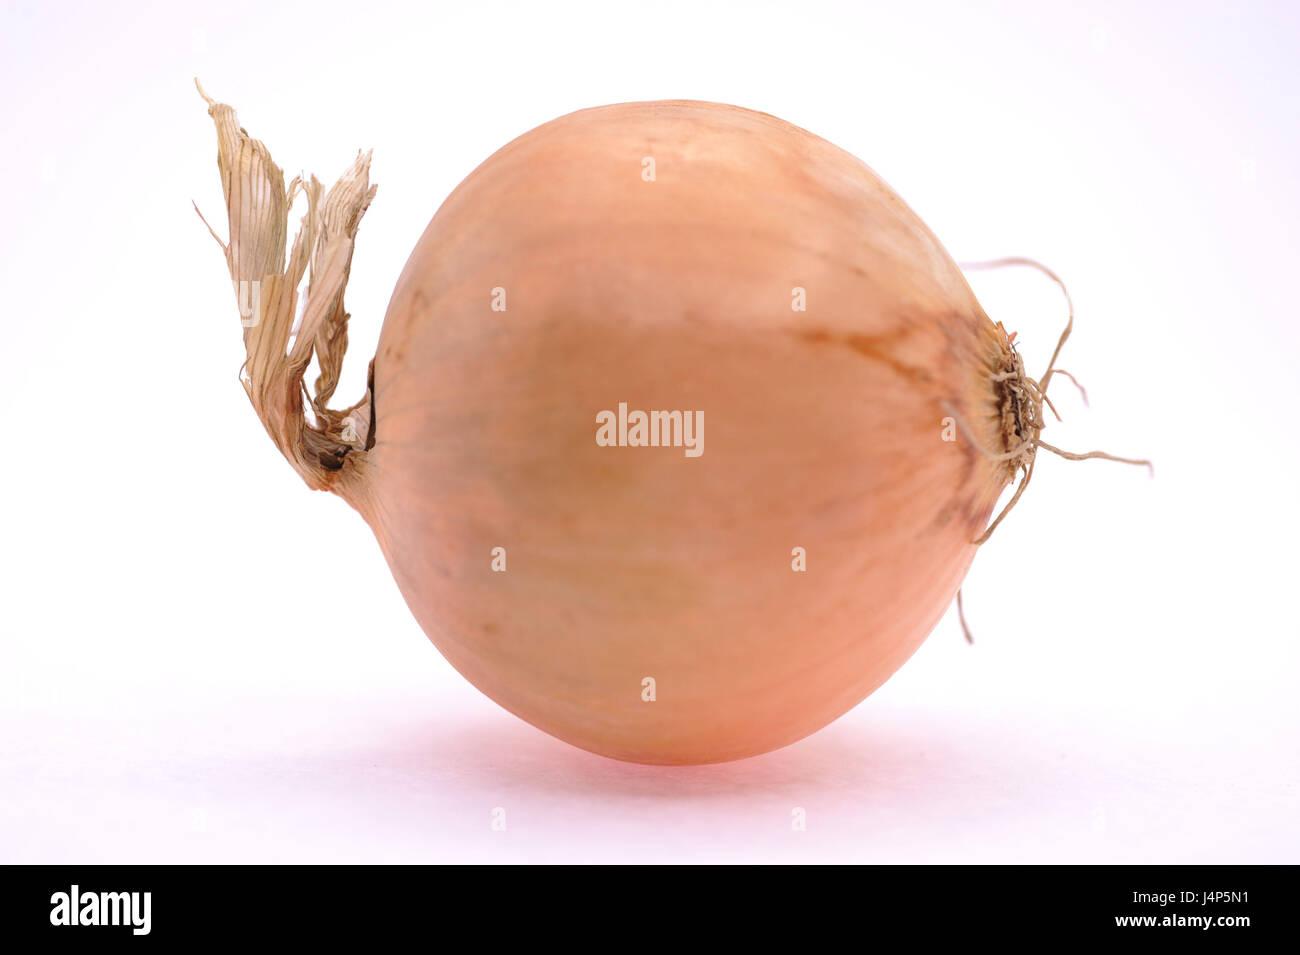 Zwiebel, Allium Cepa, Freis Platte, Stockbild